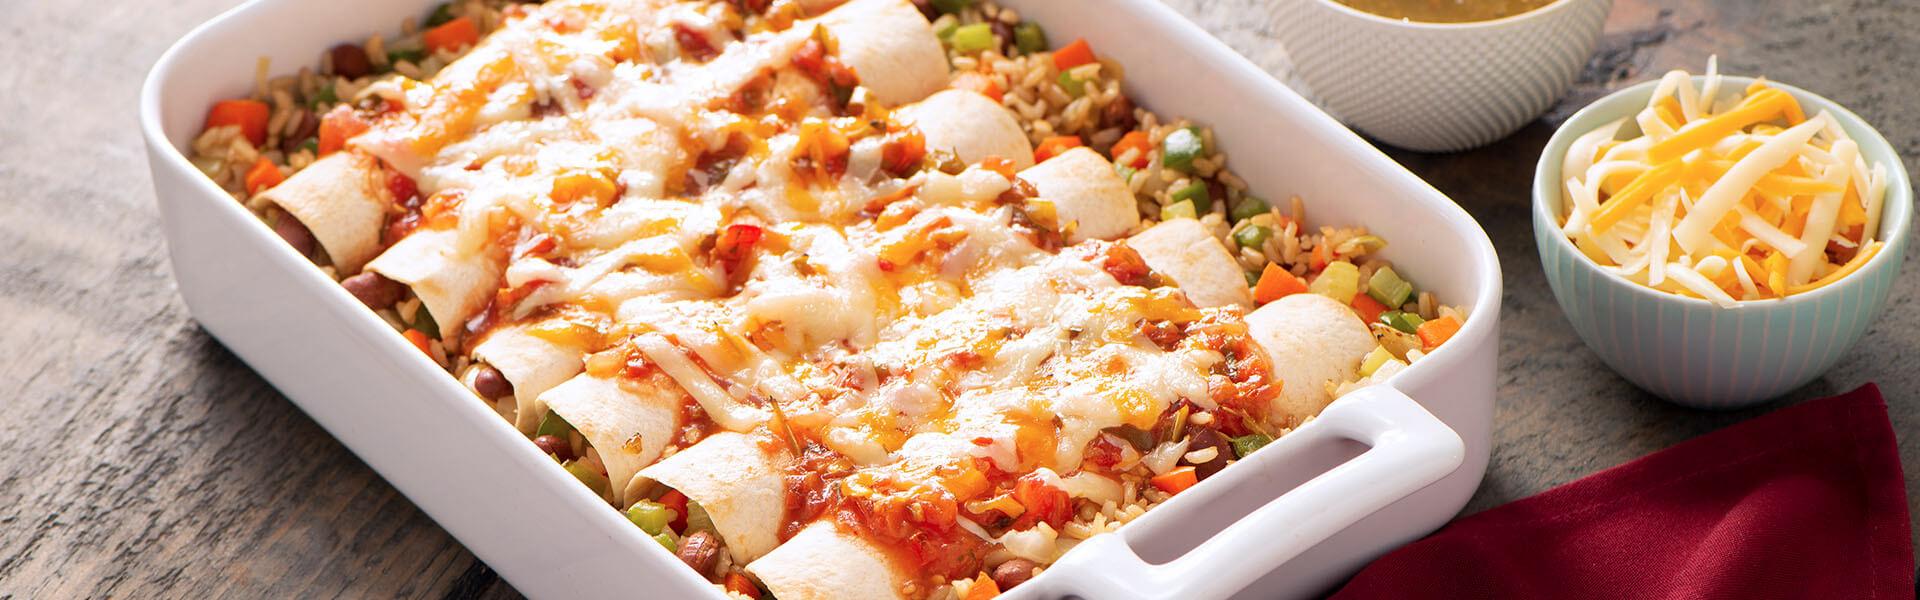 Enchiladas vegetarianas con arroz integral